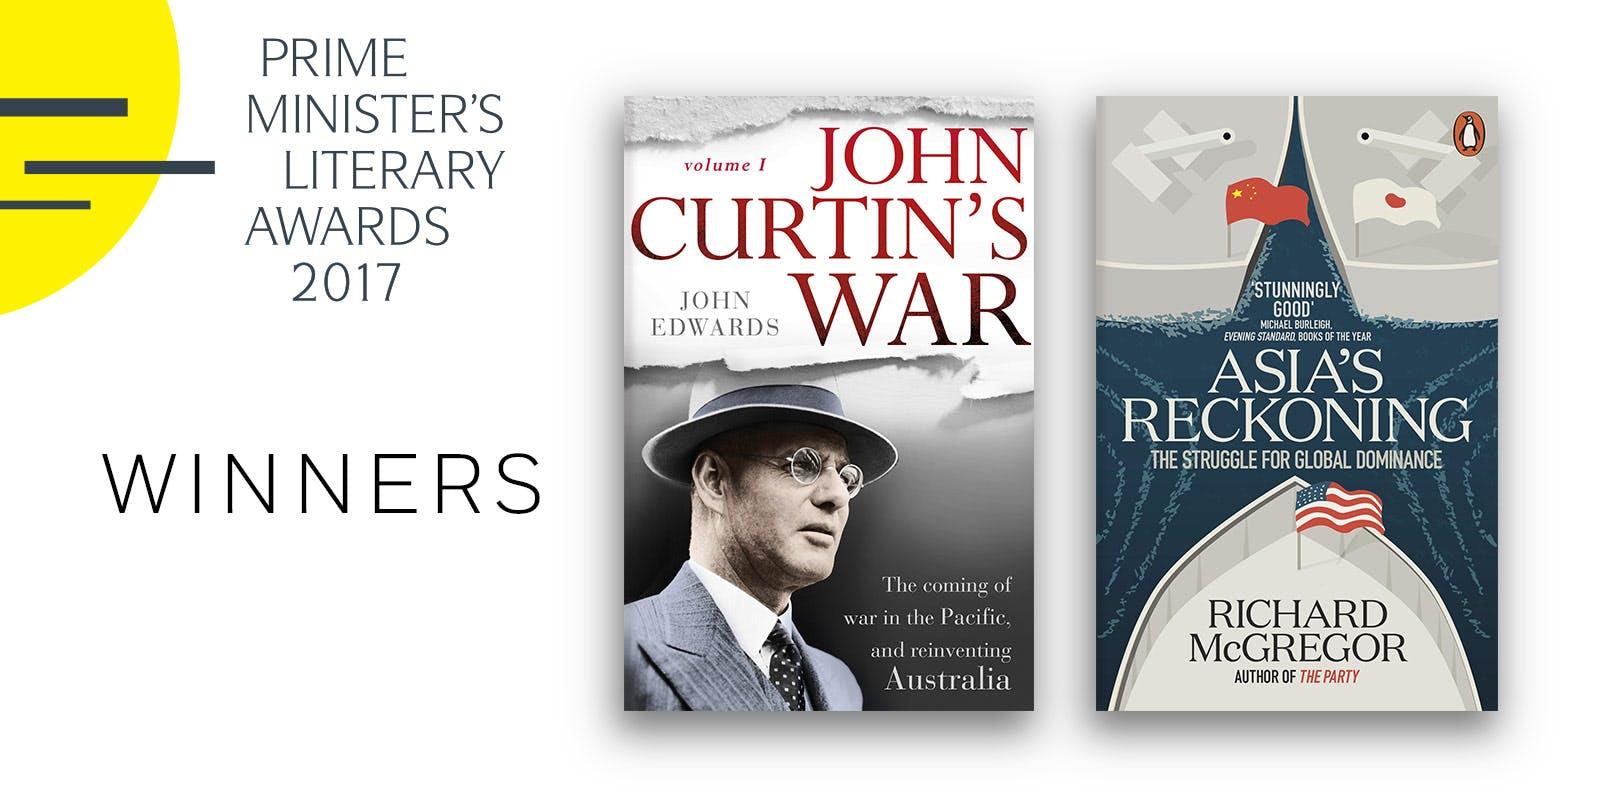 Prime Minister's Literary Award winners announced